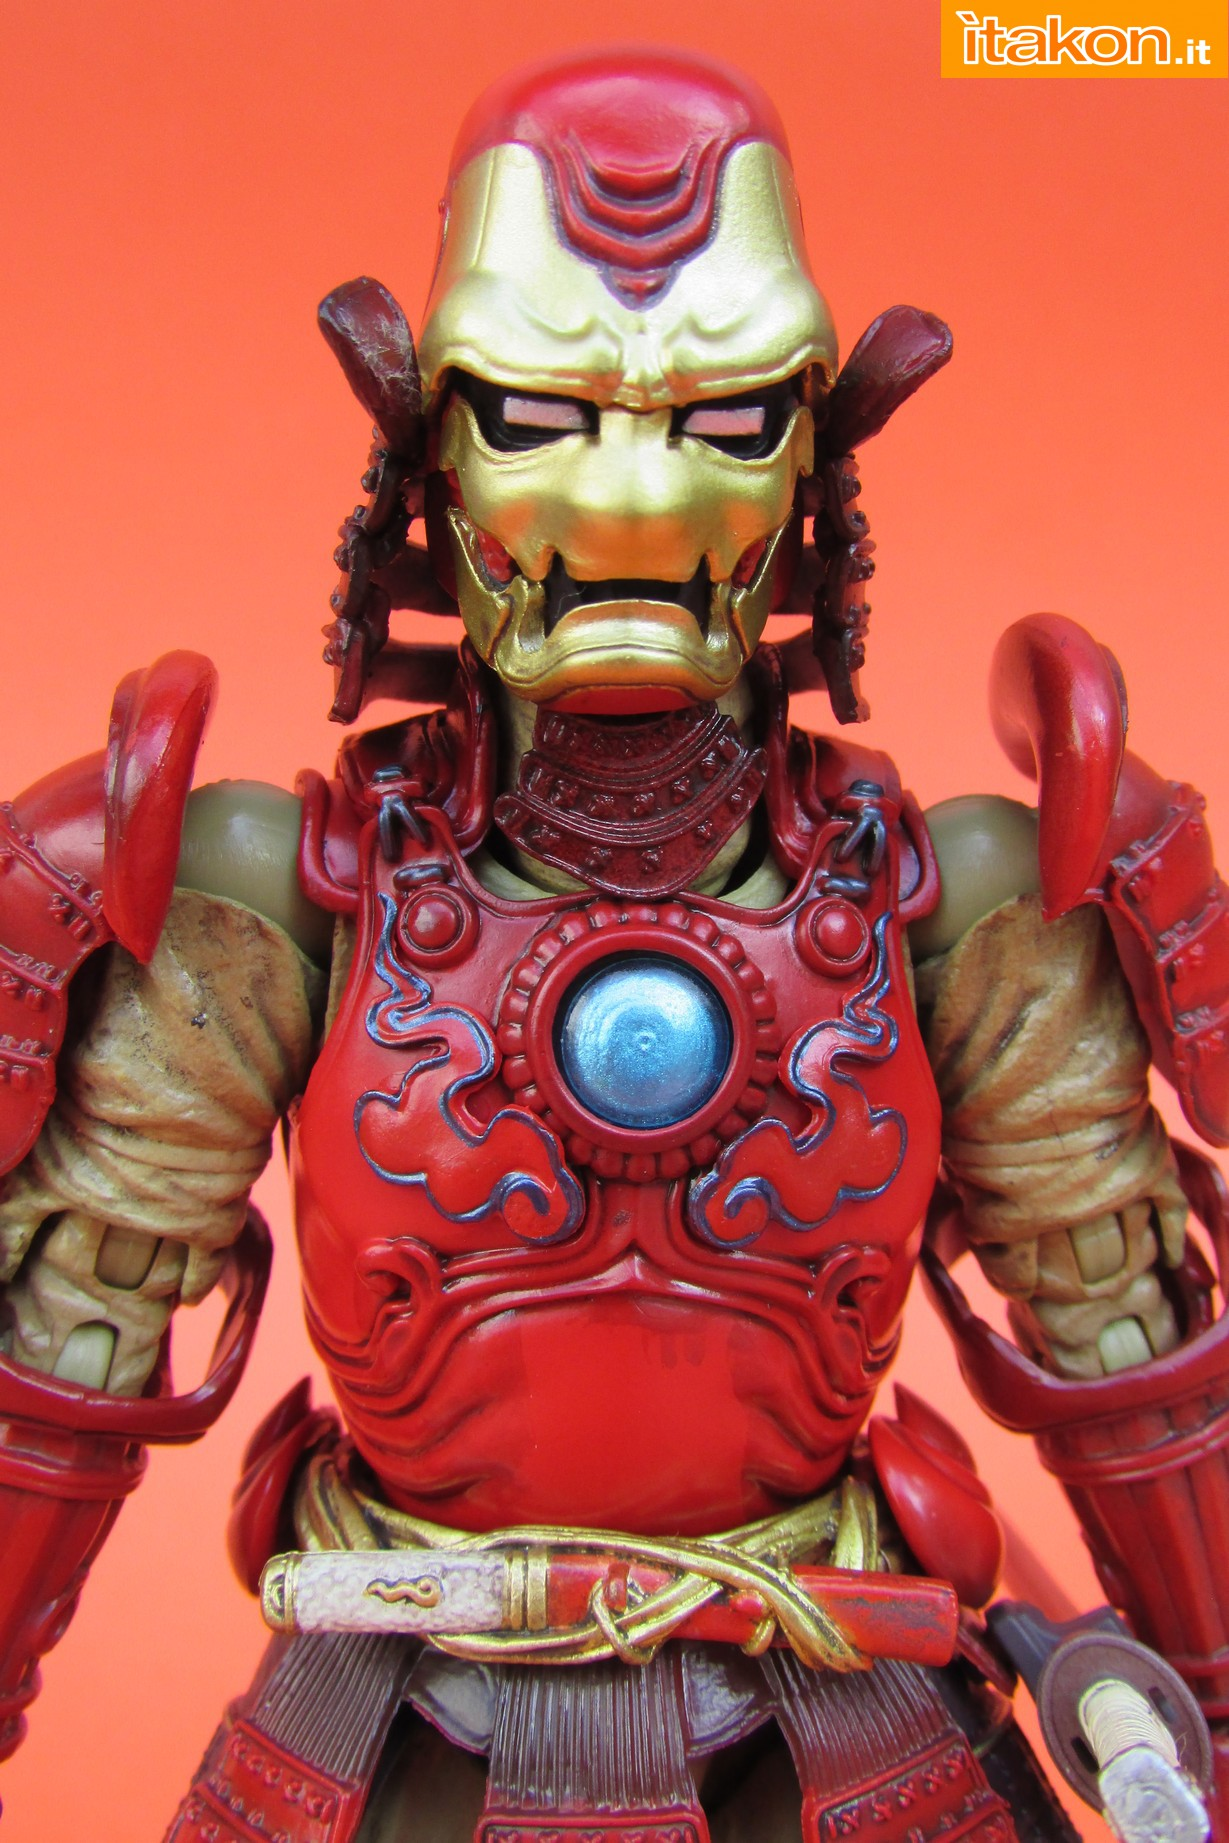 Link a Marvel Comics Koutetsu Samurai Iron Man Mark 3 Meishou MANGA REALIZATION review Bandai Itakon.it16